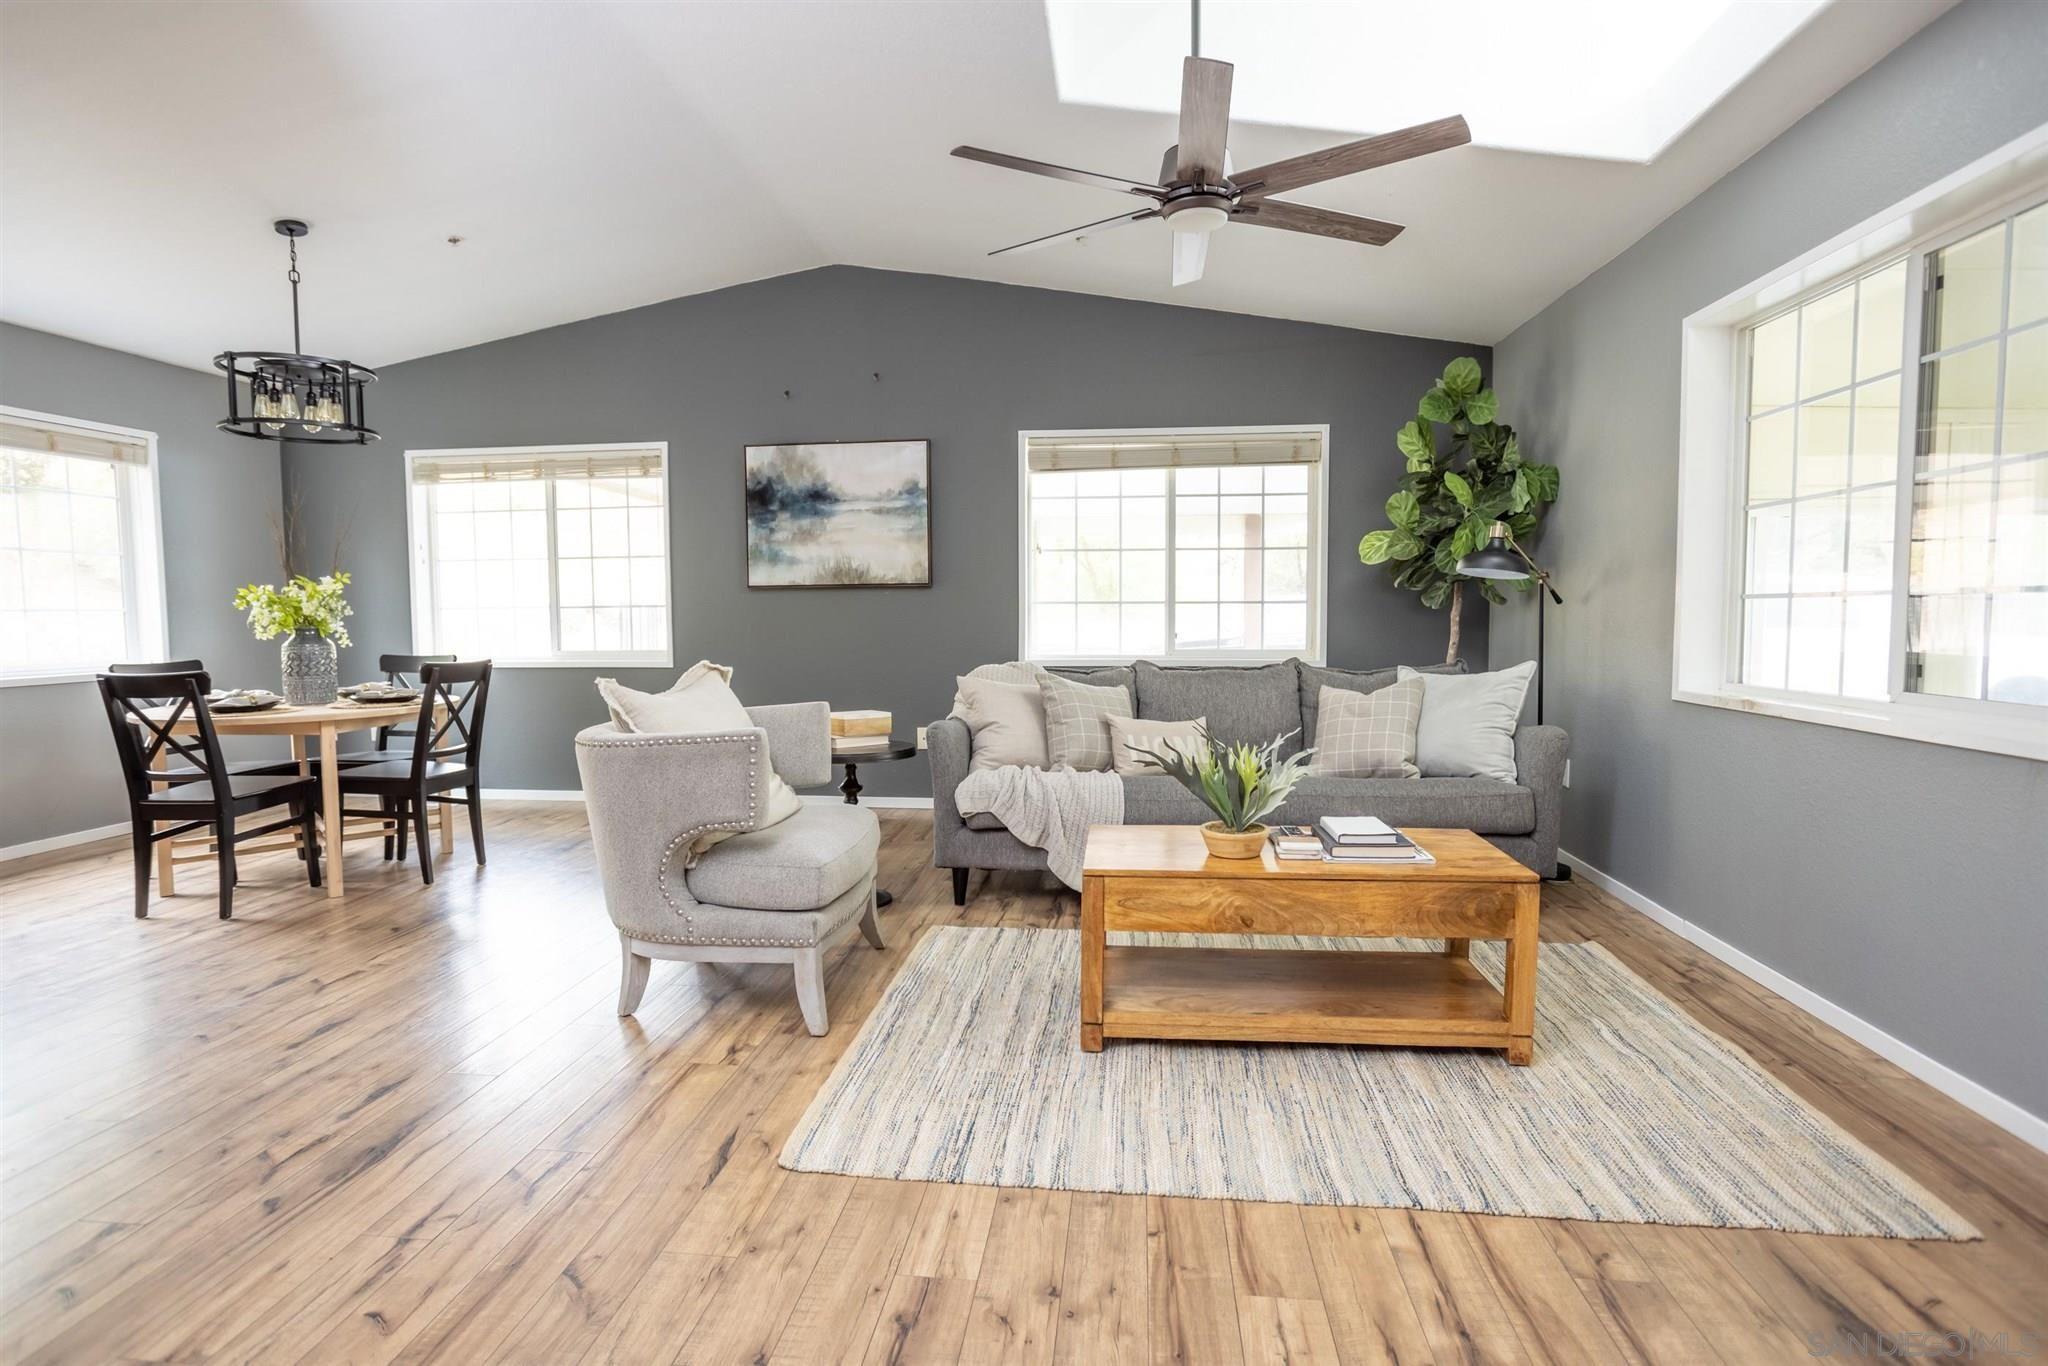 Main Photo: ALPINE House for sale : 3 bedrooms : 636 N N Glen Oaks Dr